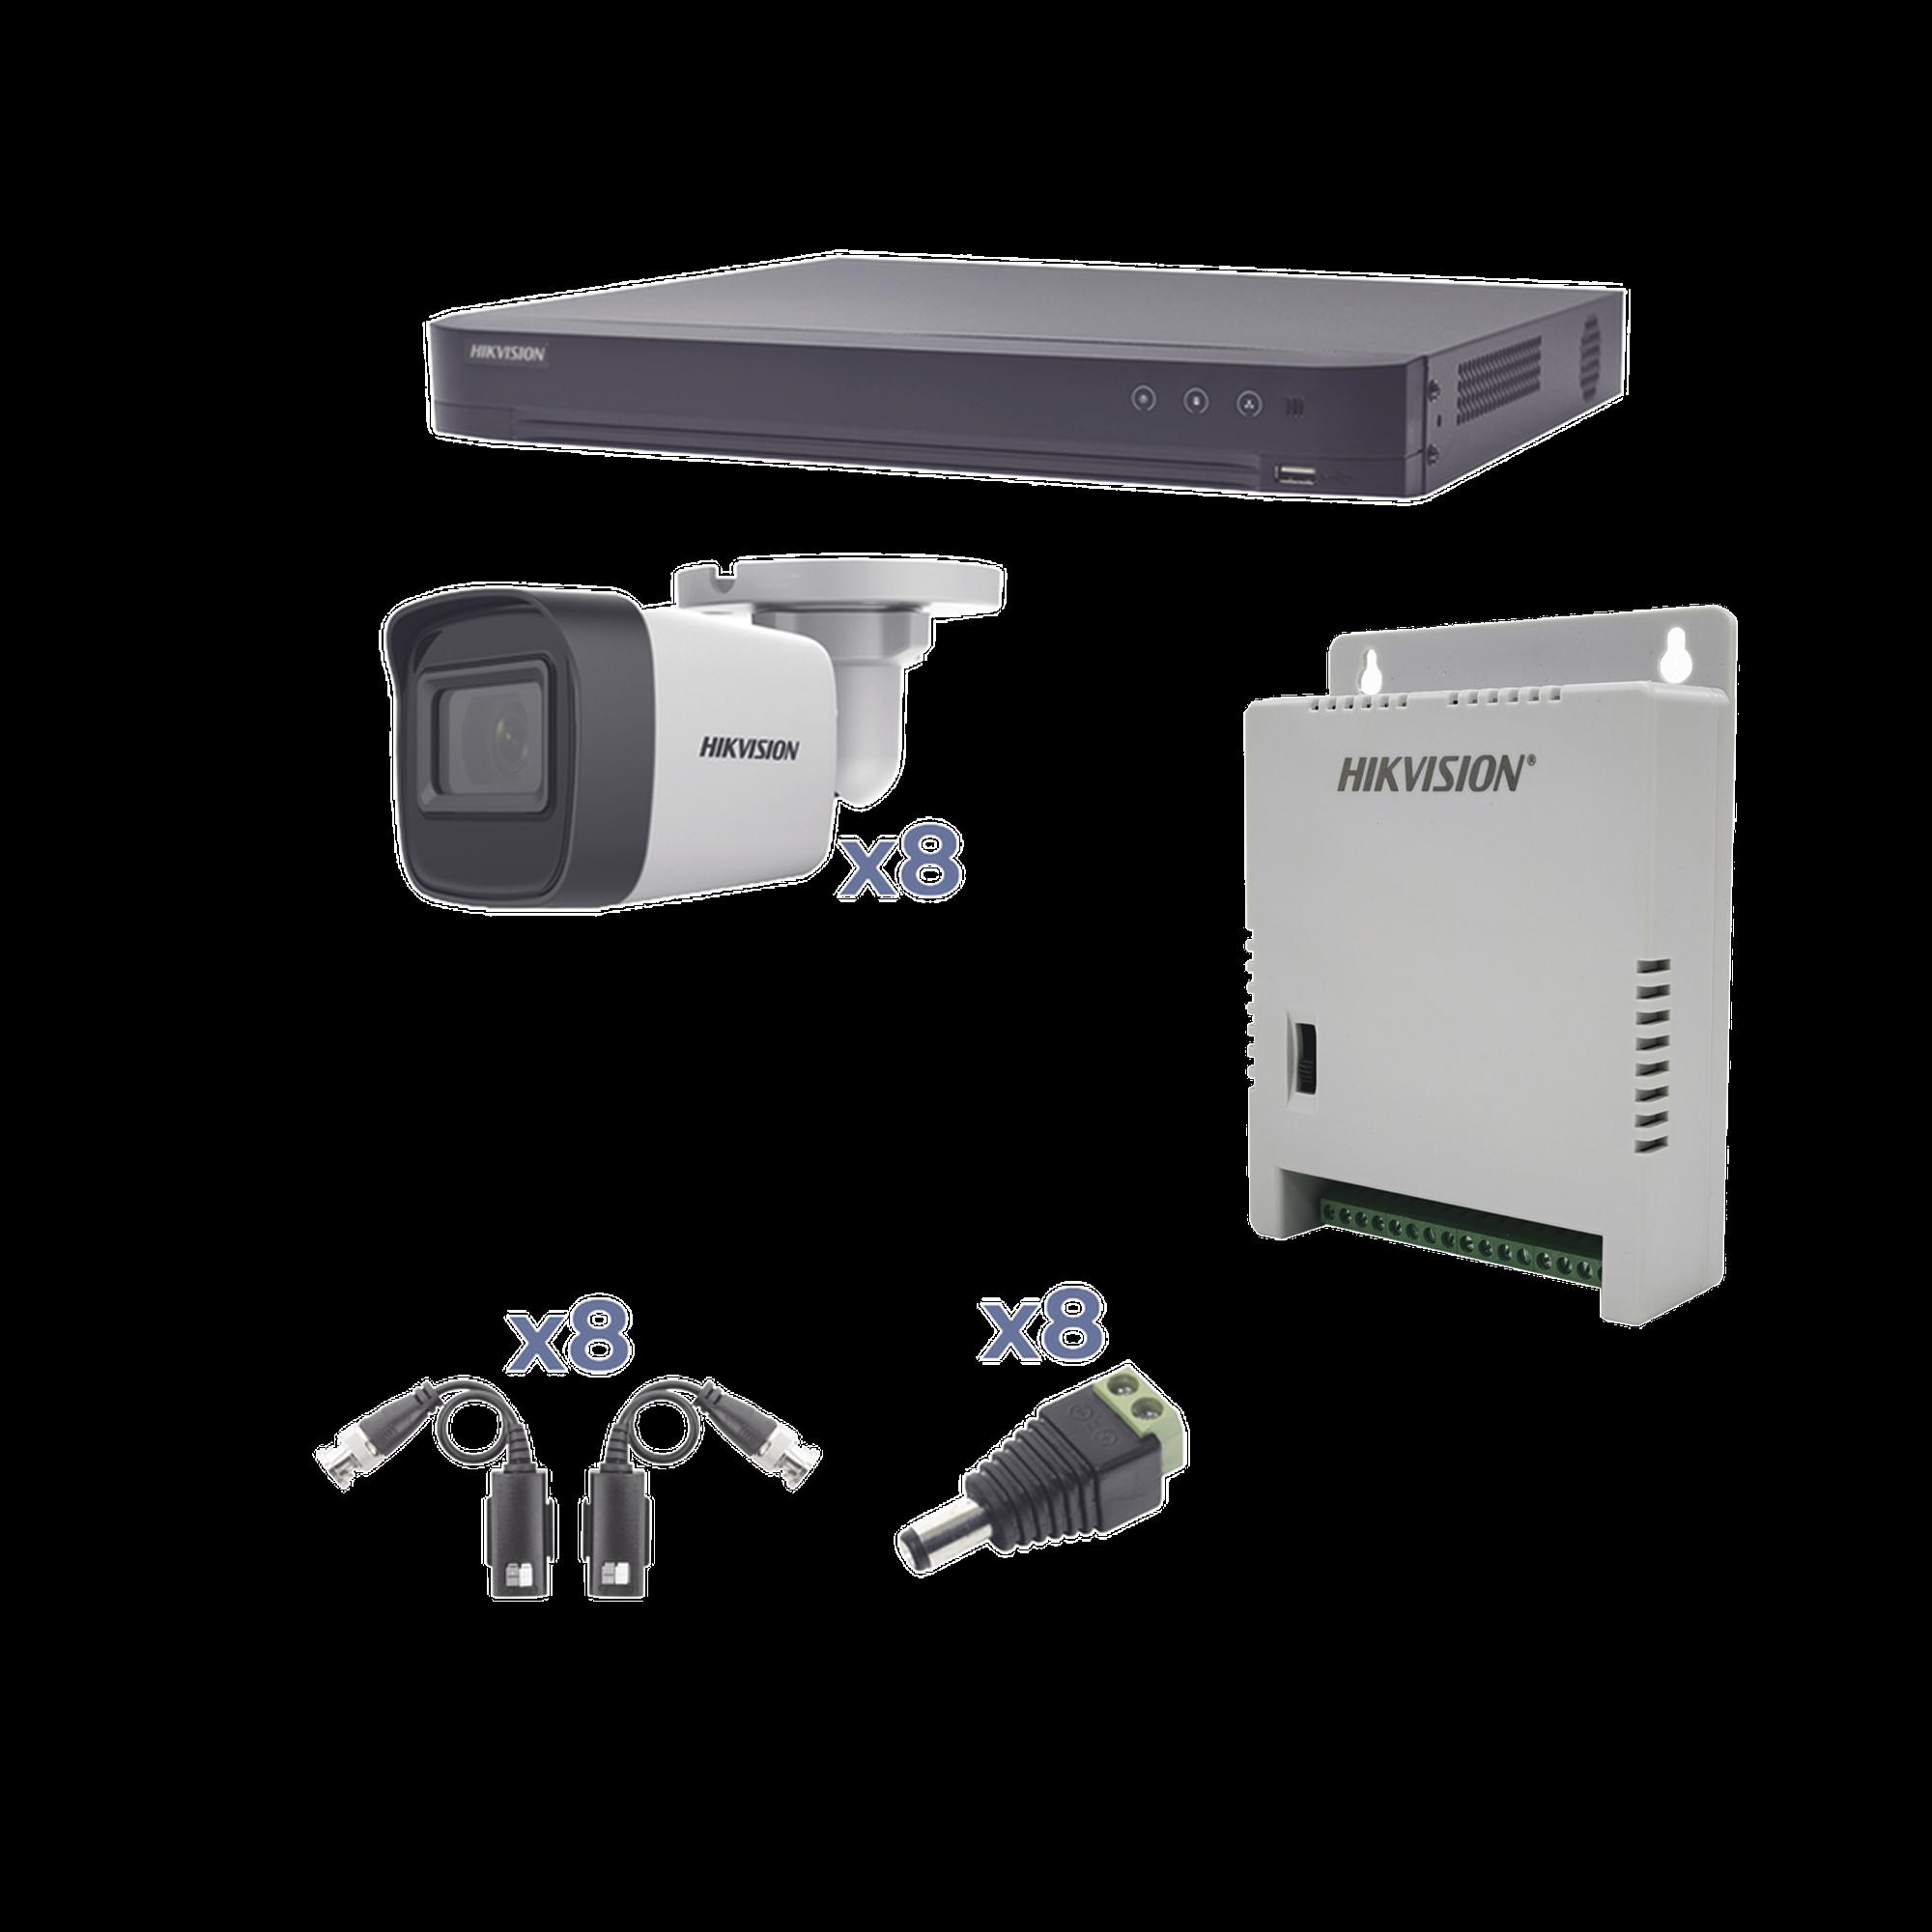 KIT TurboHD 1080p / DVR 8 Canales / 8 Cámaras Bala (exterior 2.8 mm) / Transceptores / Conectores / Fuente de Poder Profesional hasta 15 Vcd para Larga Distancia